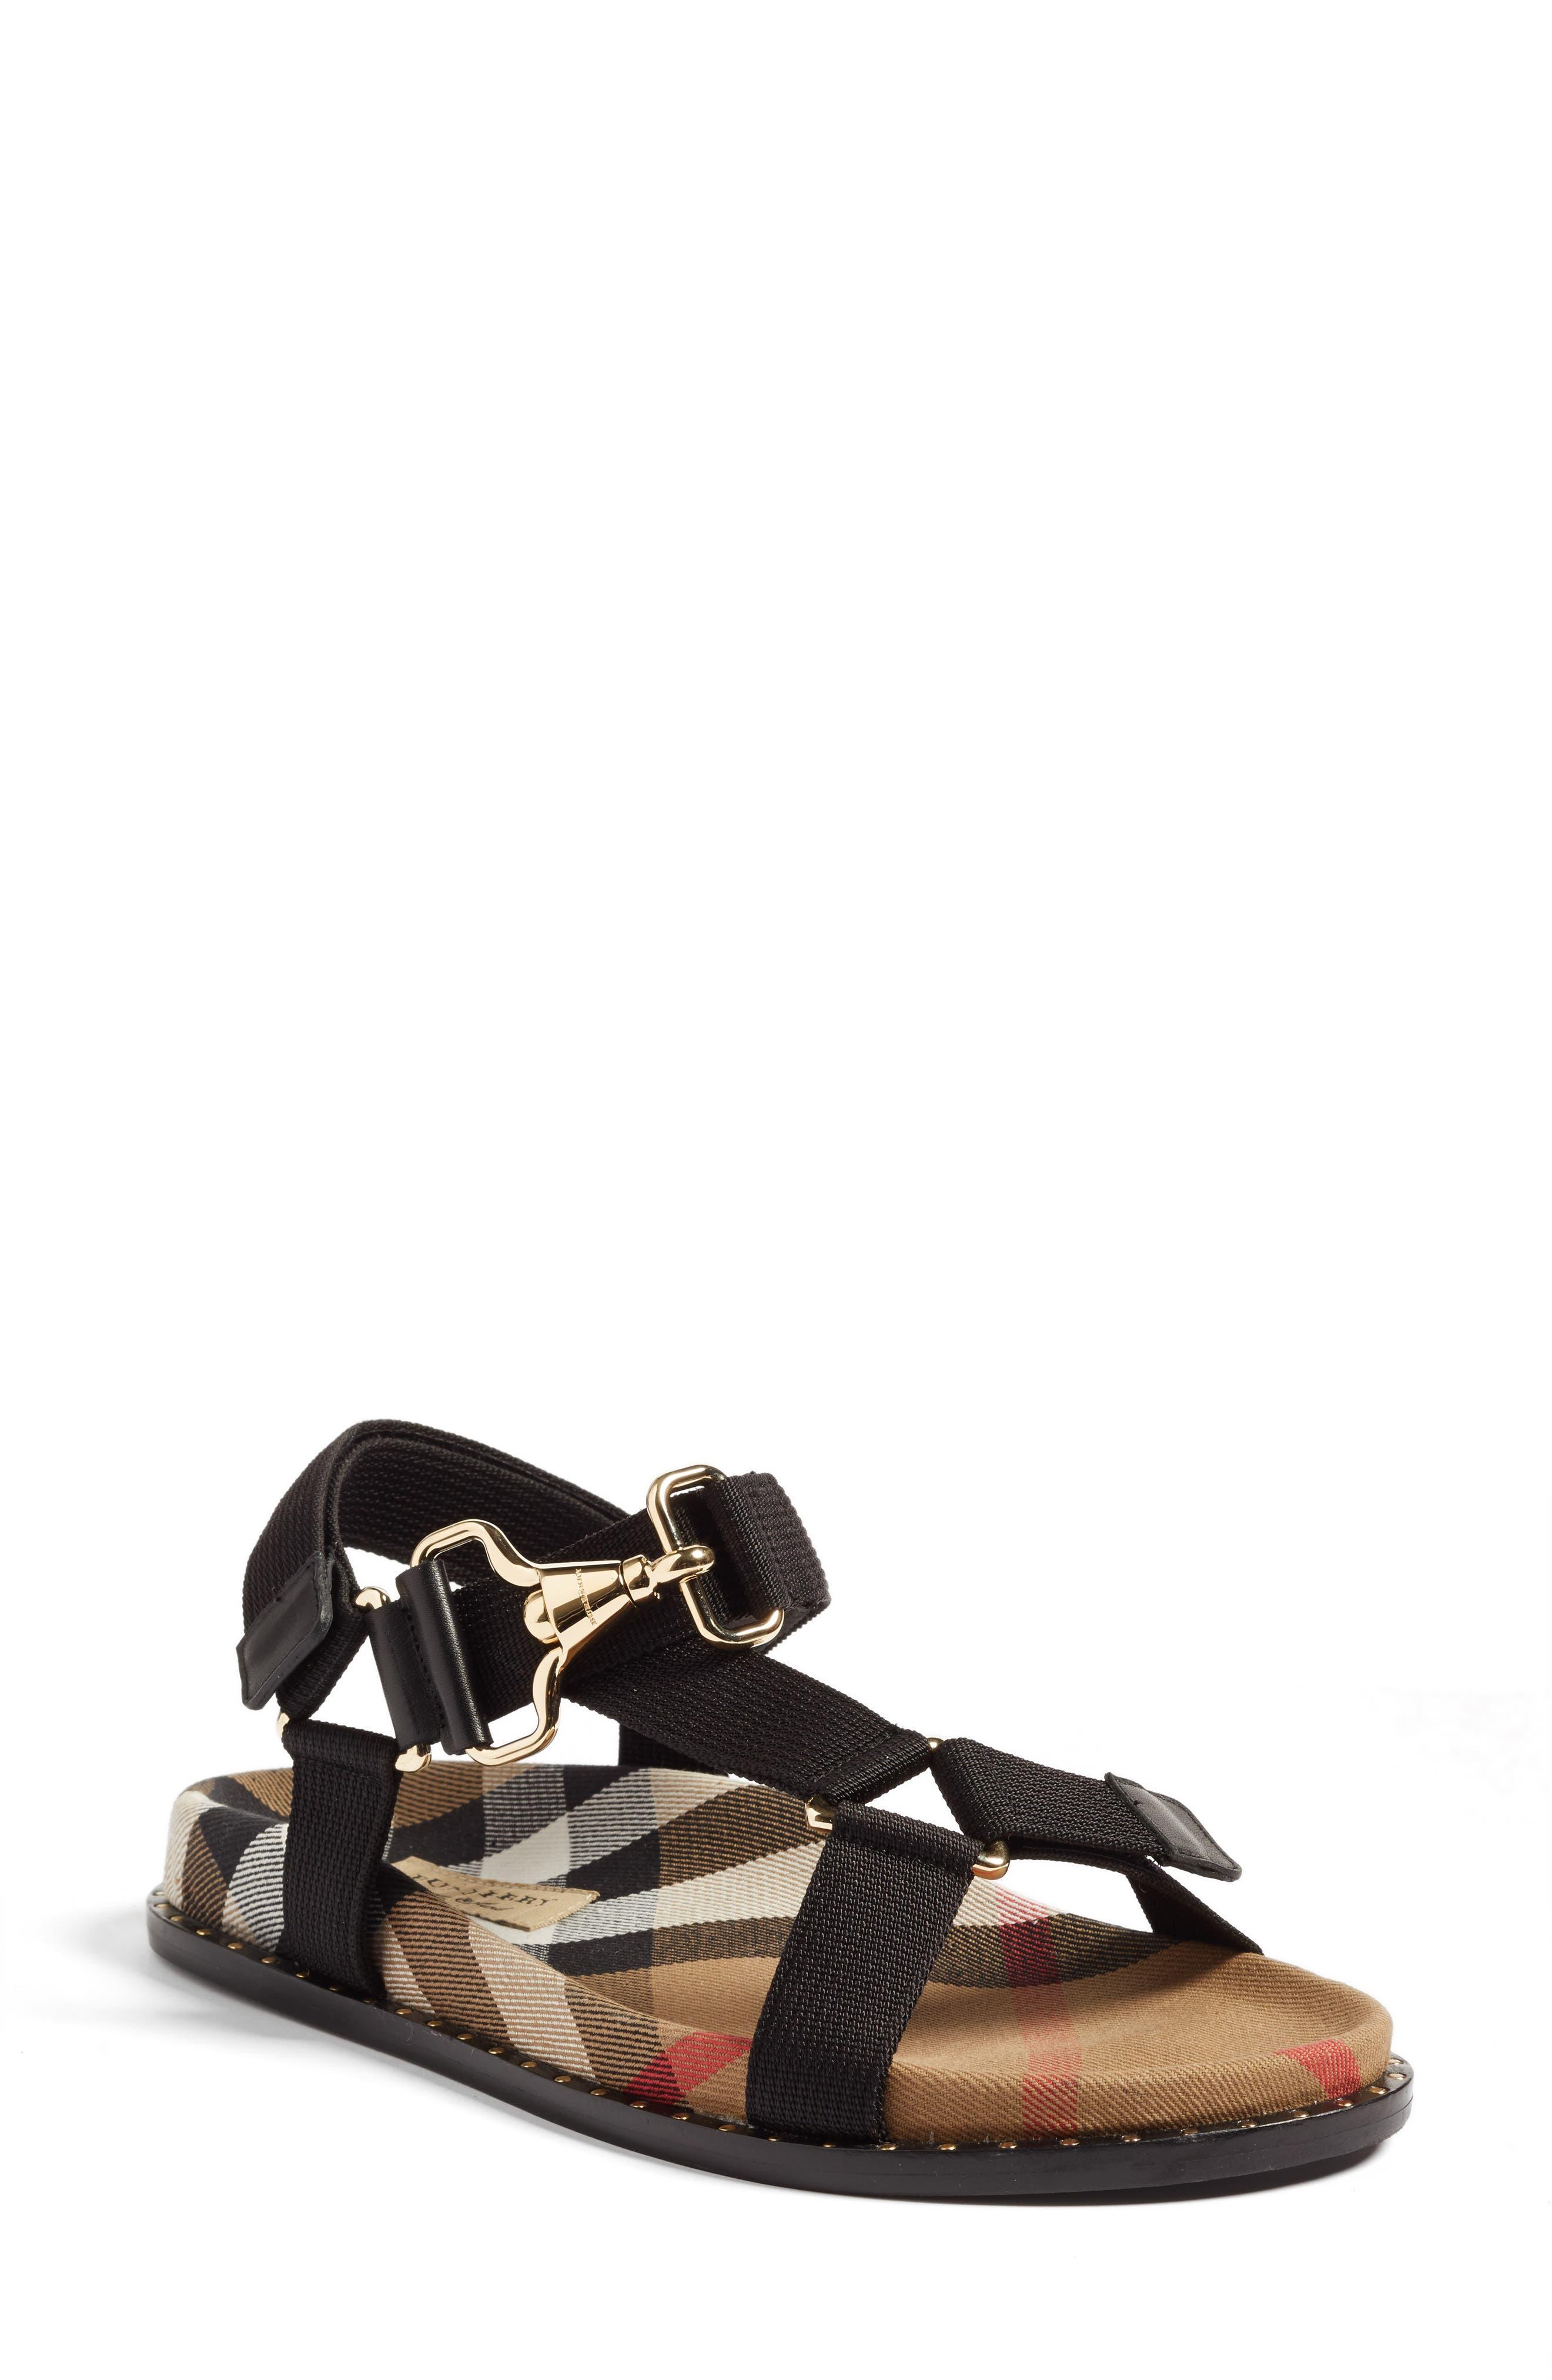 Main Image - Burberry Ardall Sandal (Women)